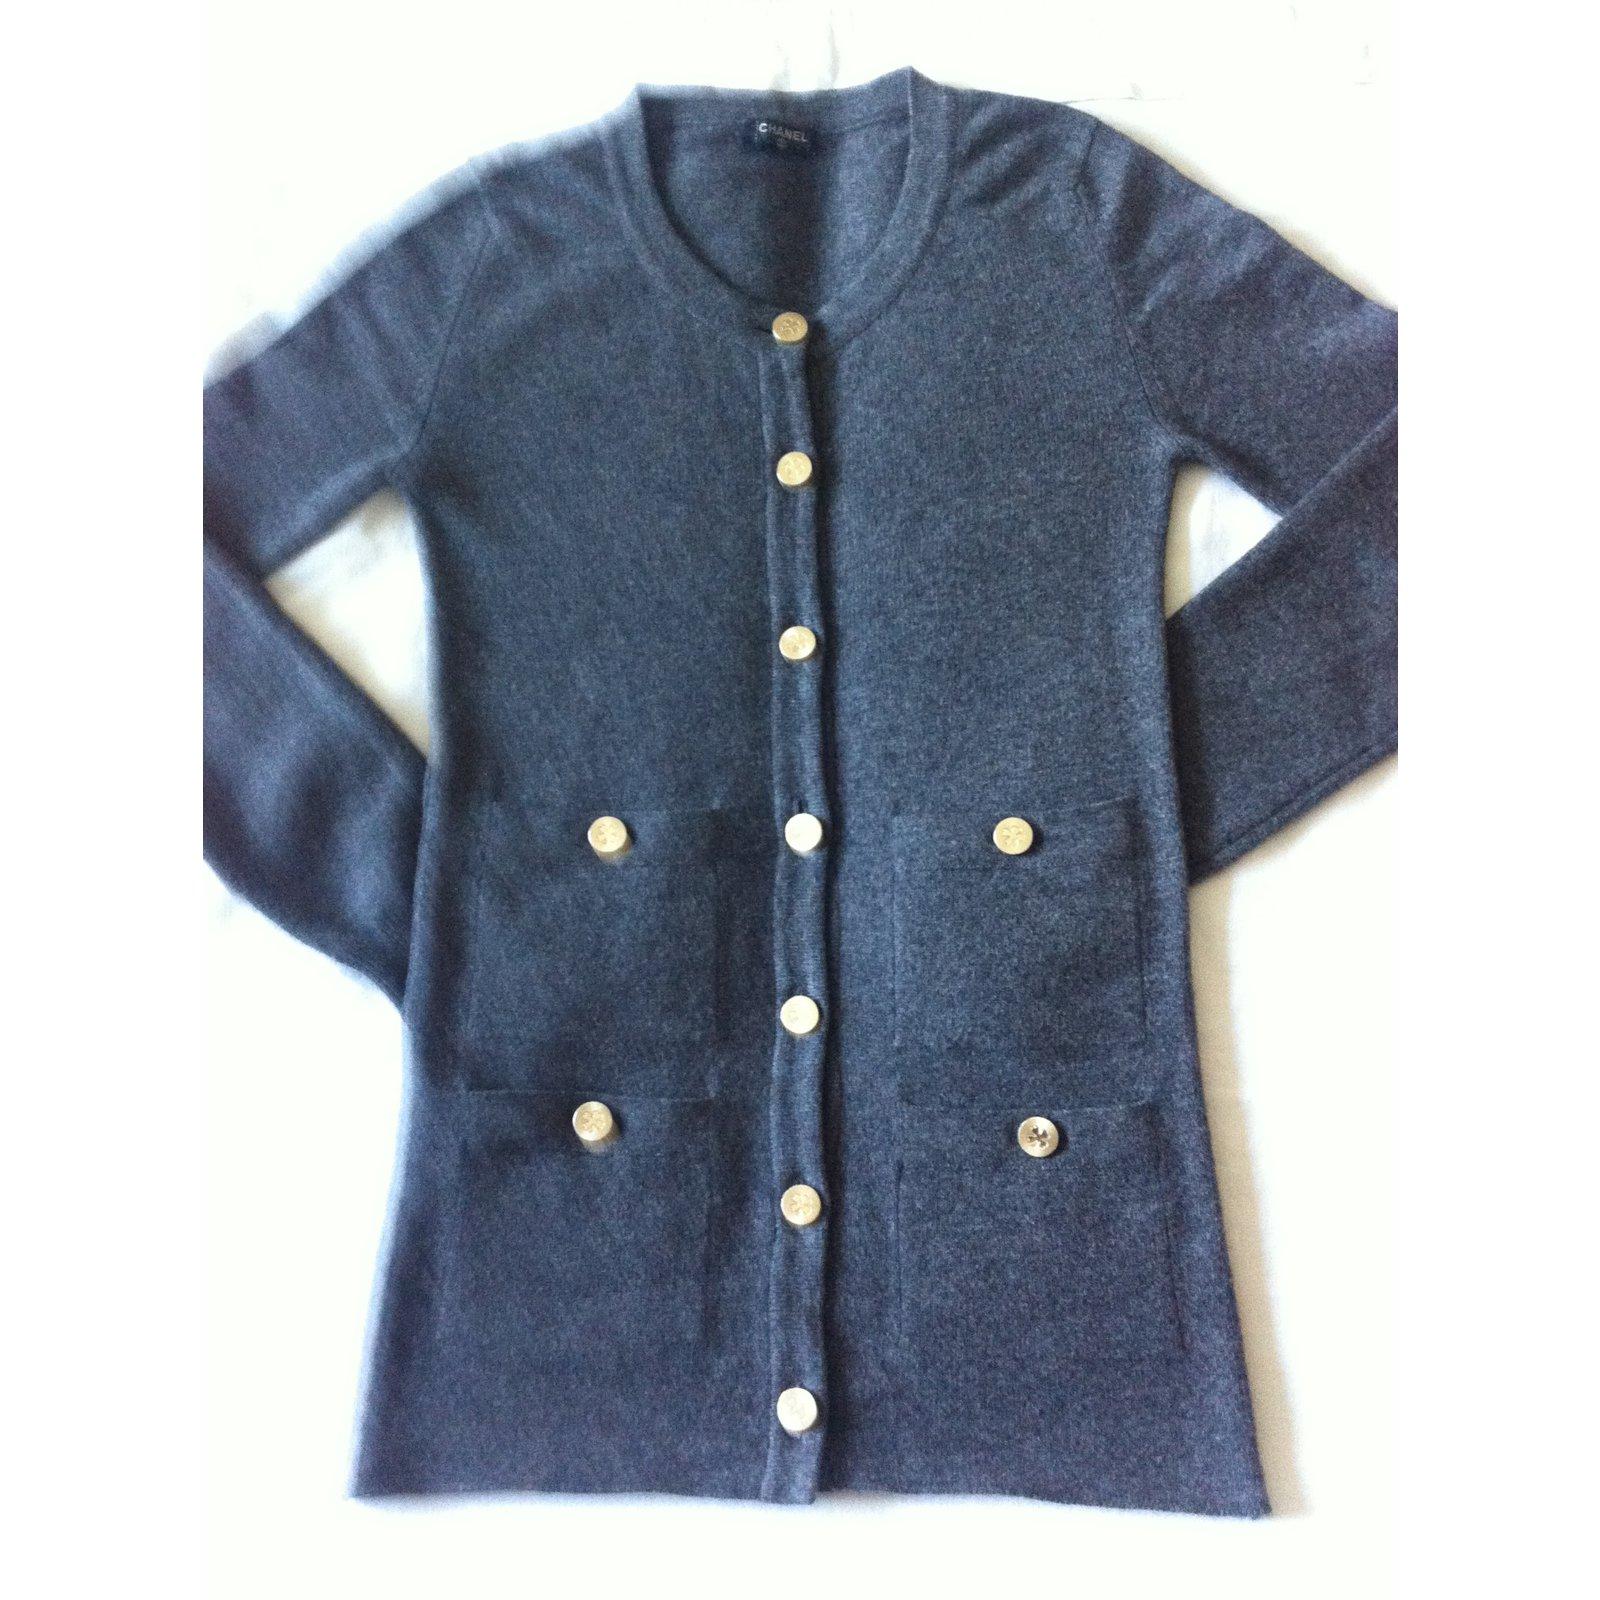 bee3f9fd5822 Pulls, Gilets Chanel Cardigan Cachemire Gris ref.30893 - Joli Closet